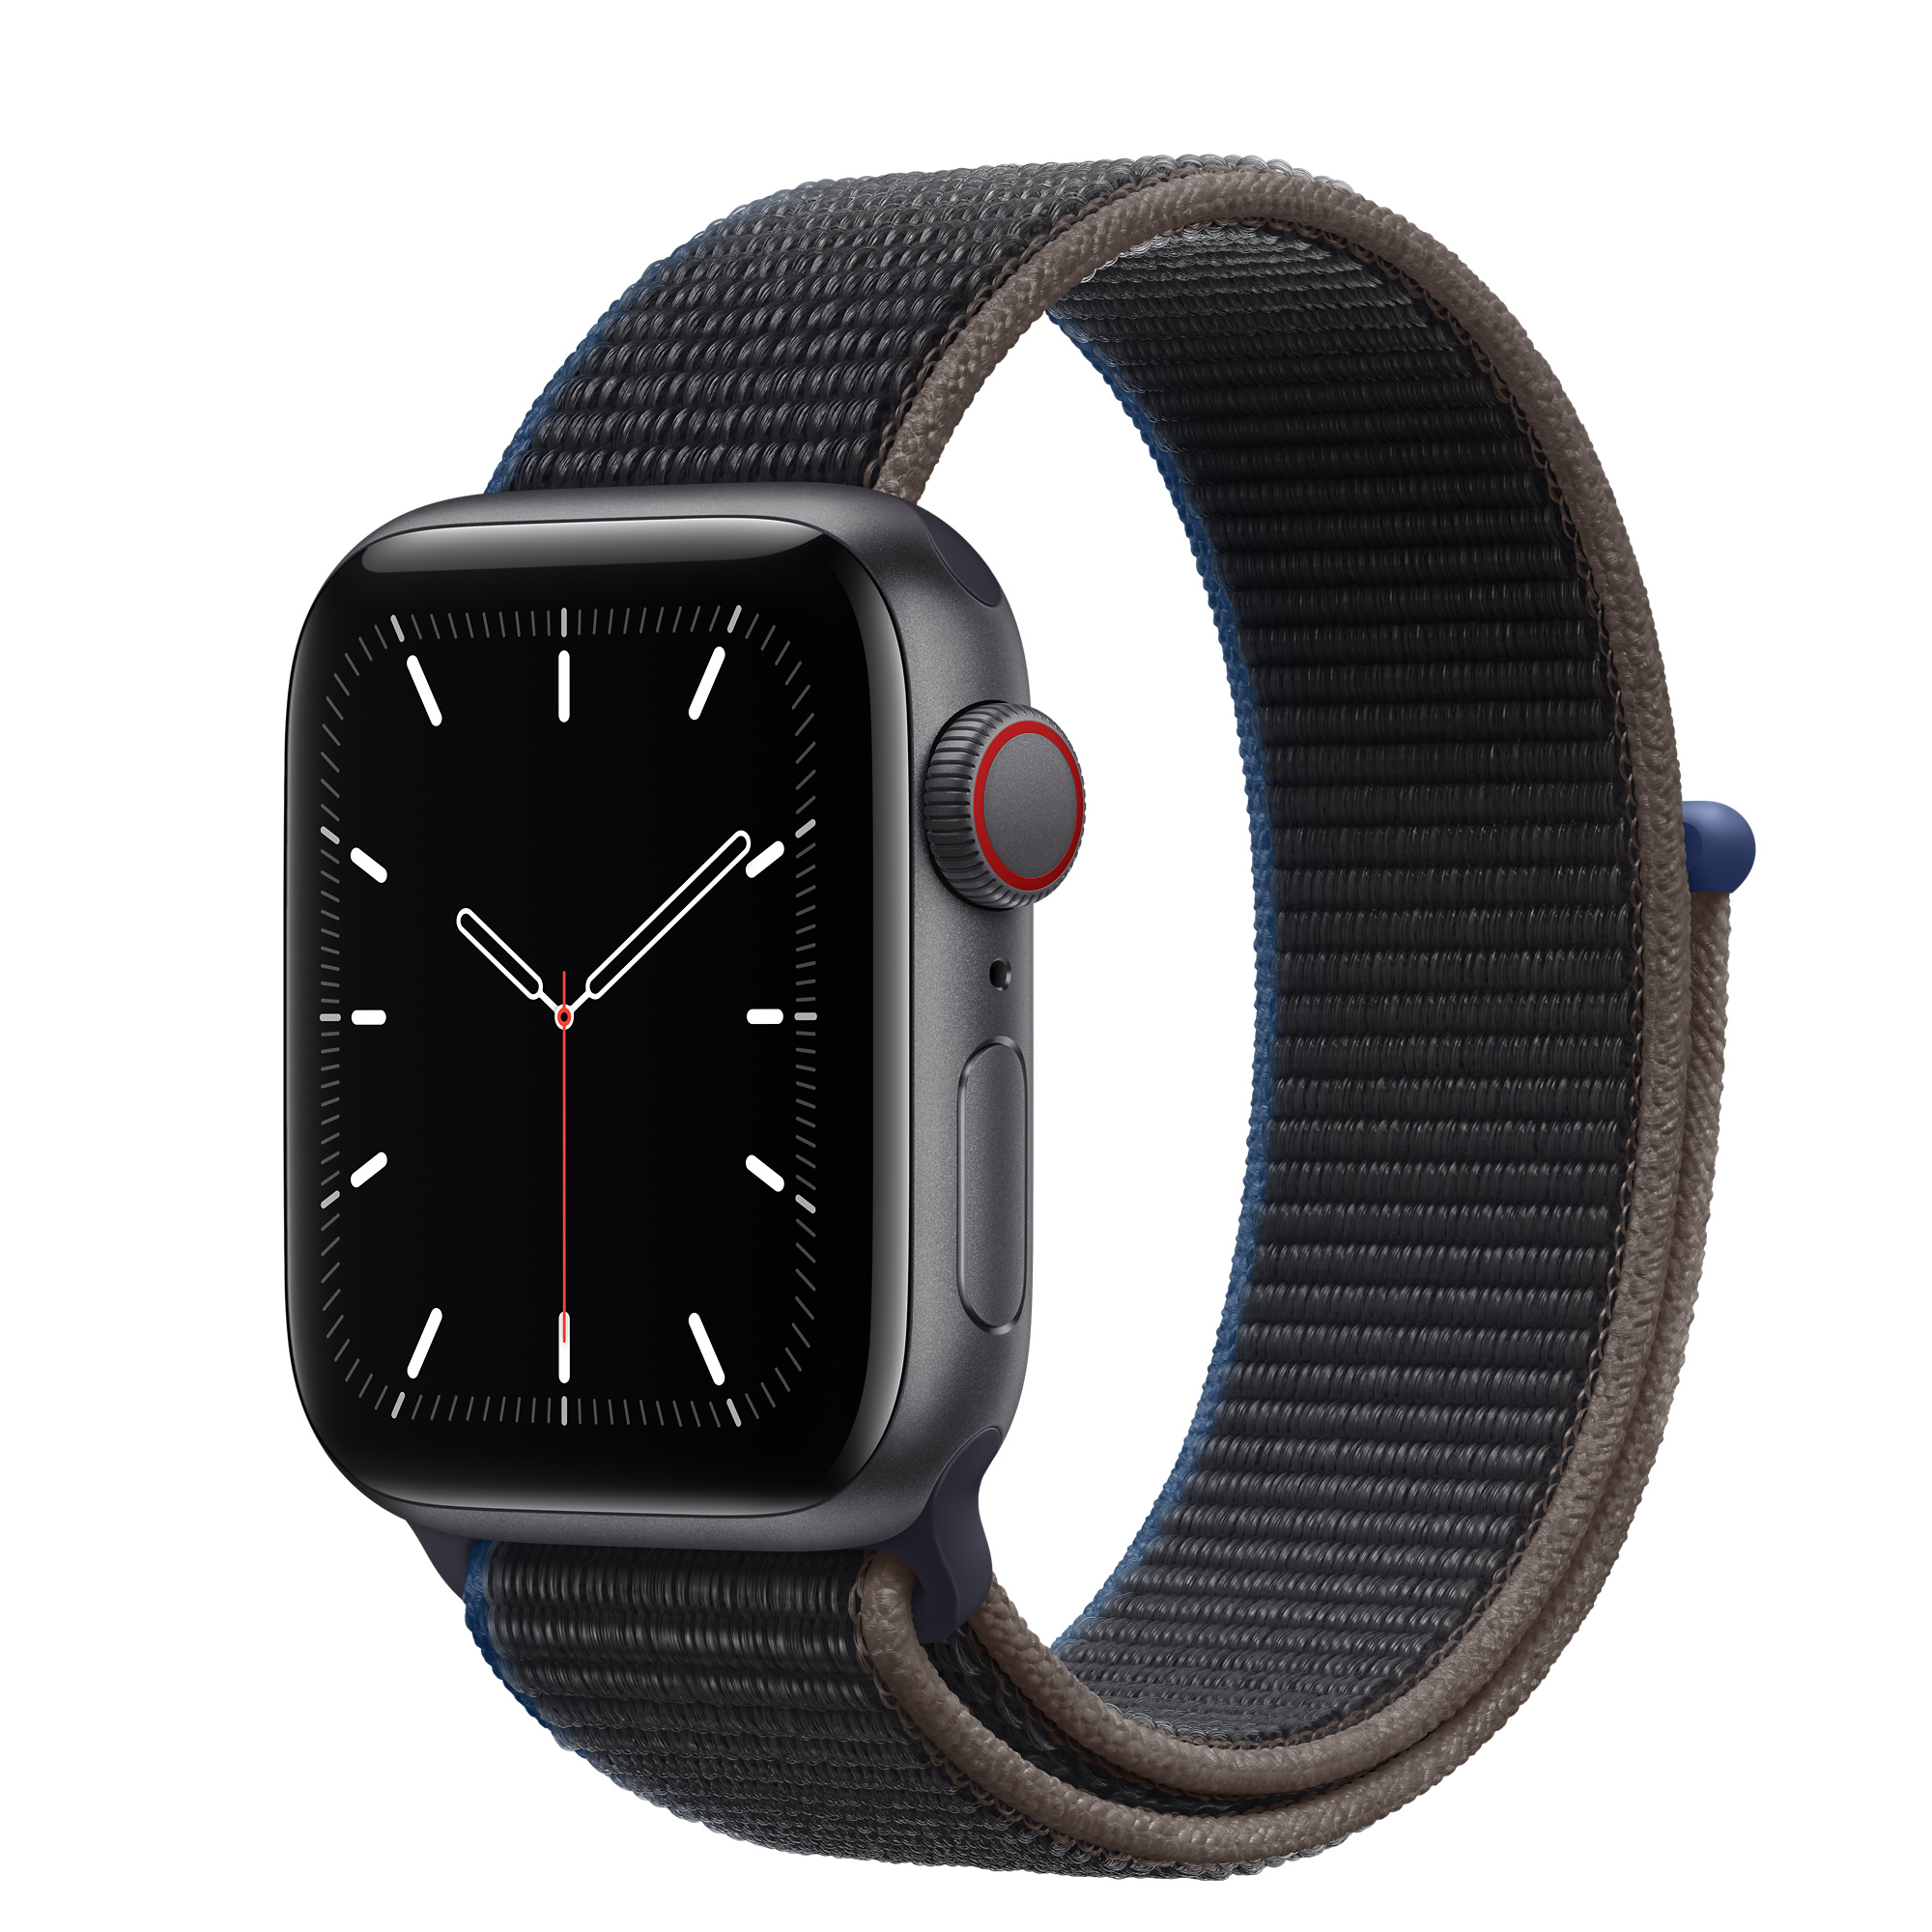 Offerta Apple Watch 6 40mm GPS Cellular su TrovaUsati.it